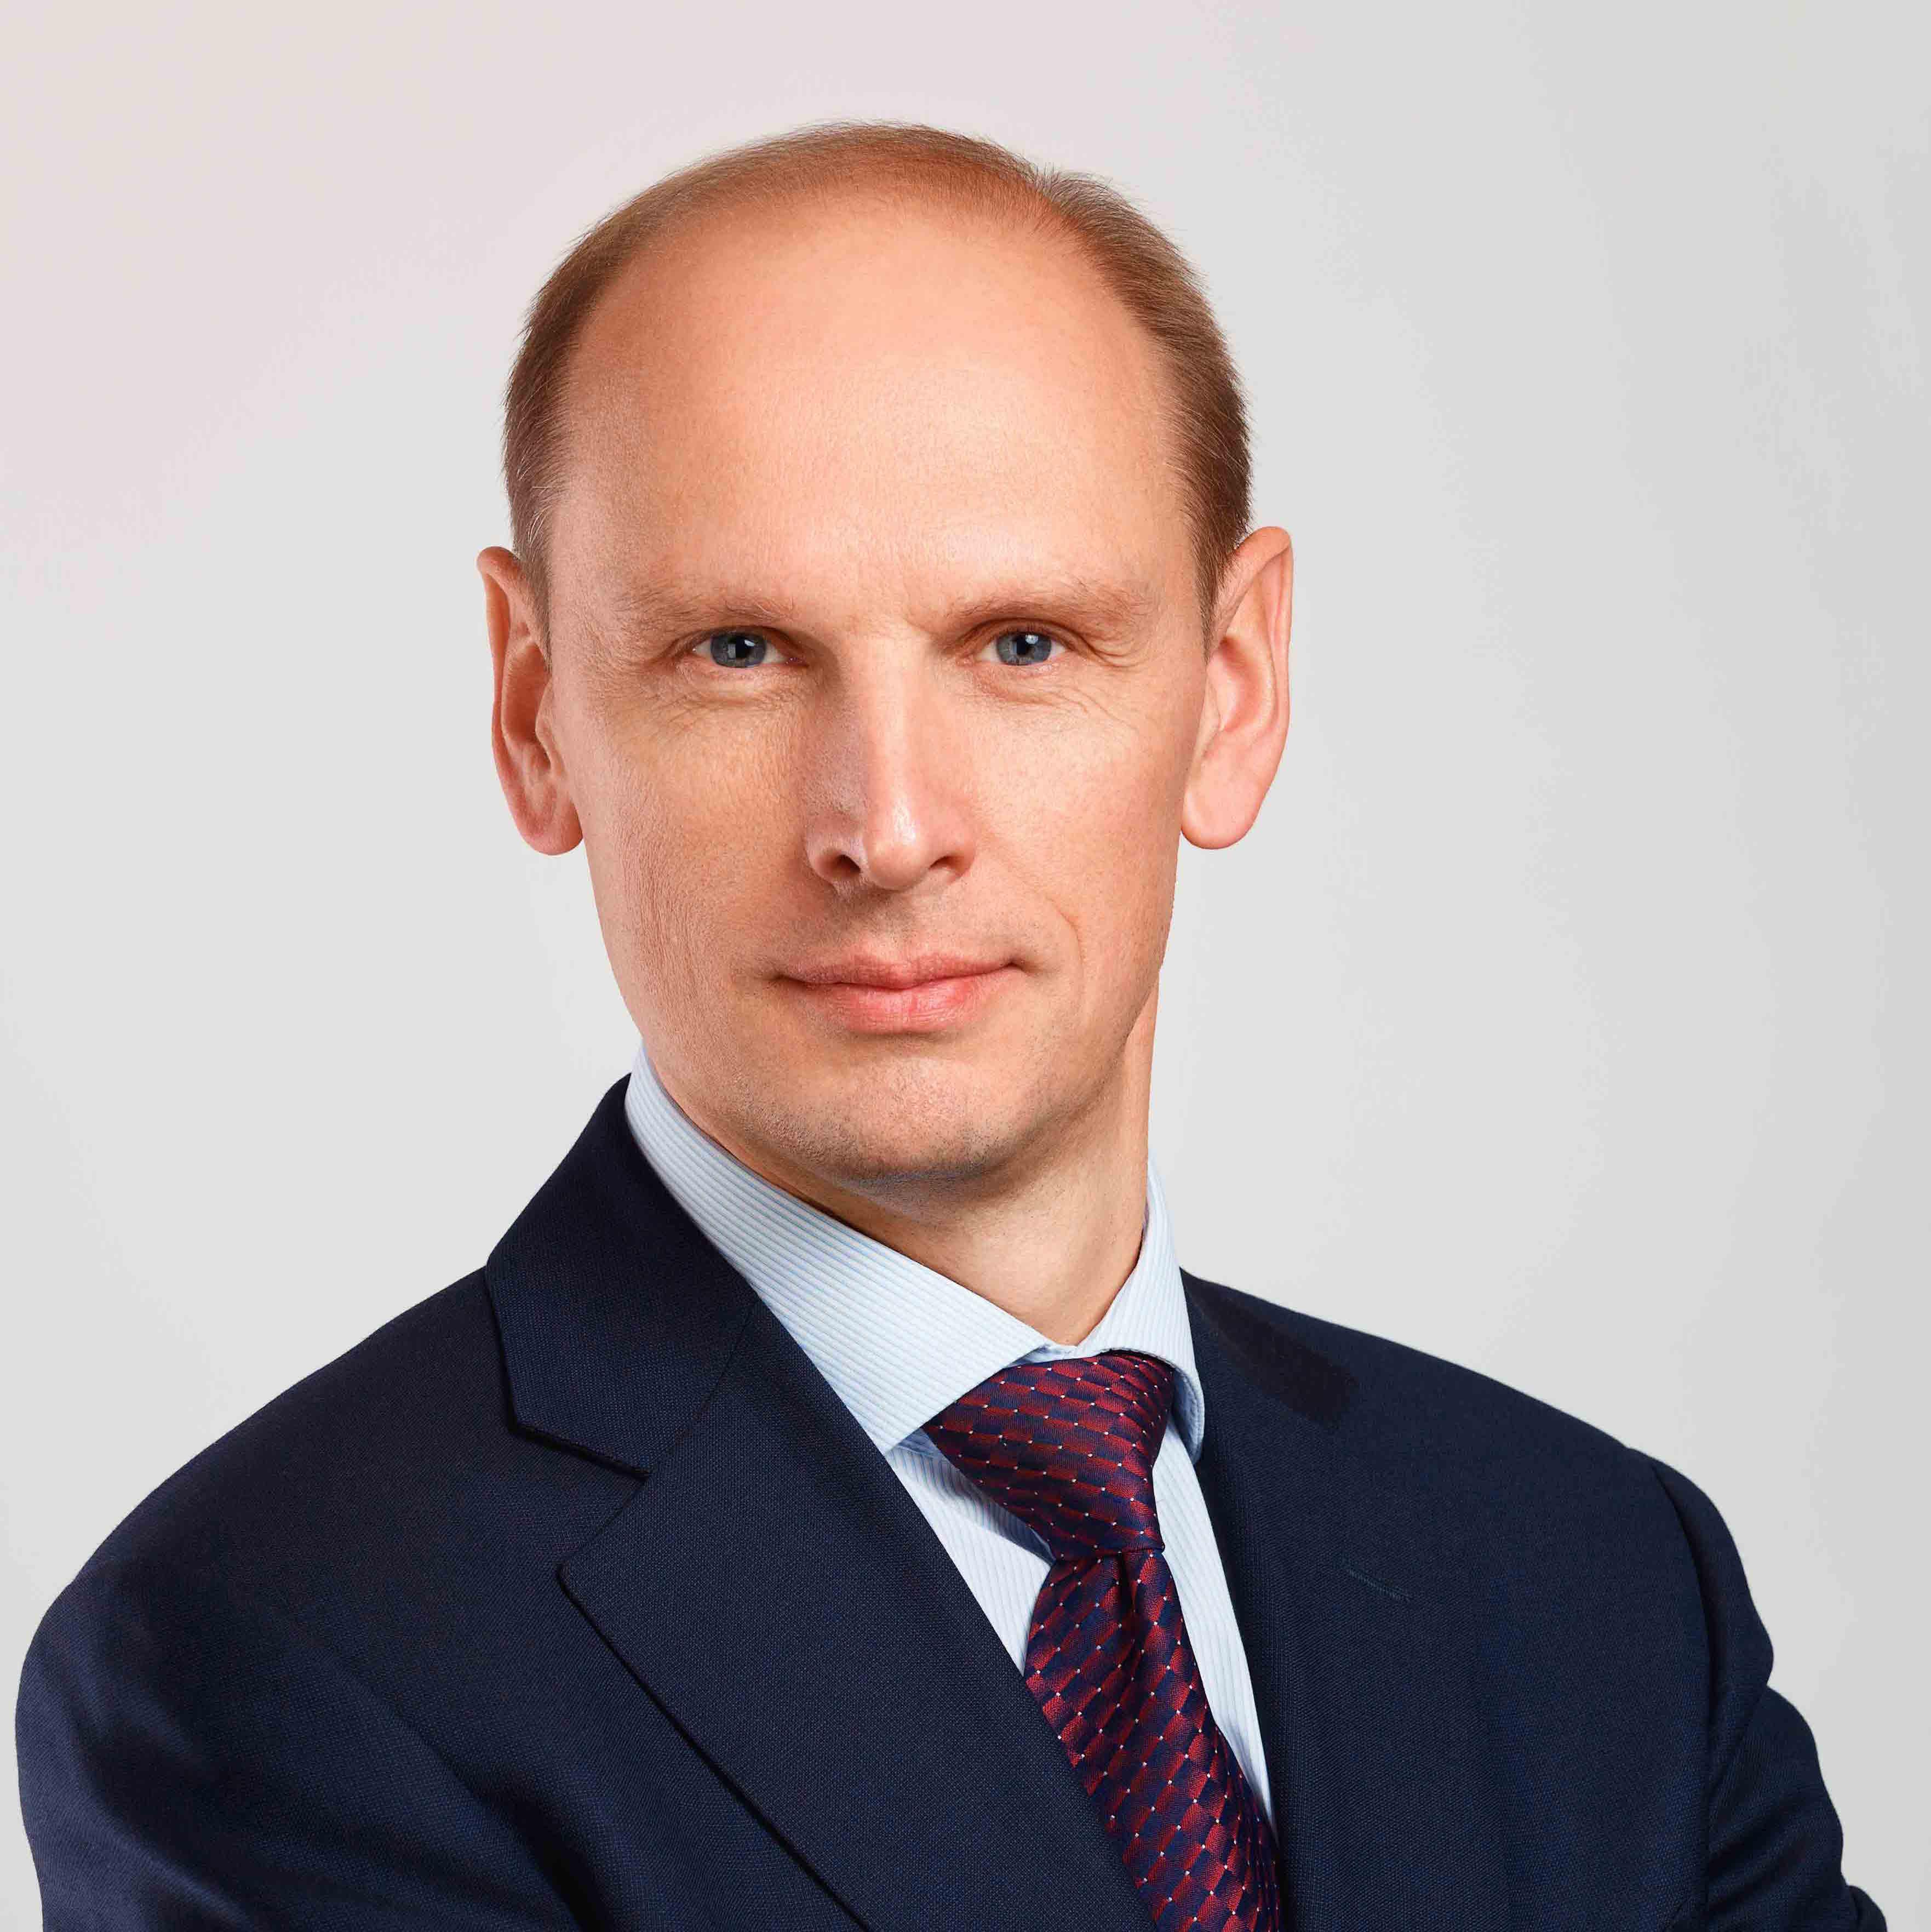 Мисько Максим Владимирович 2